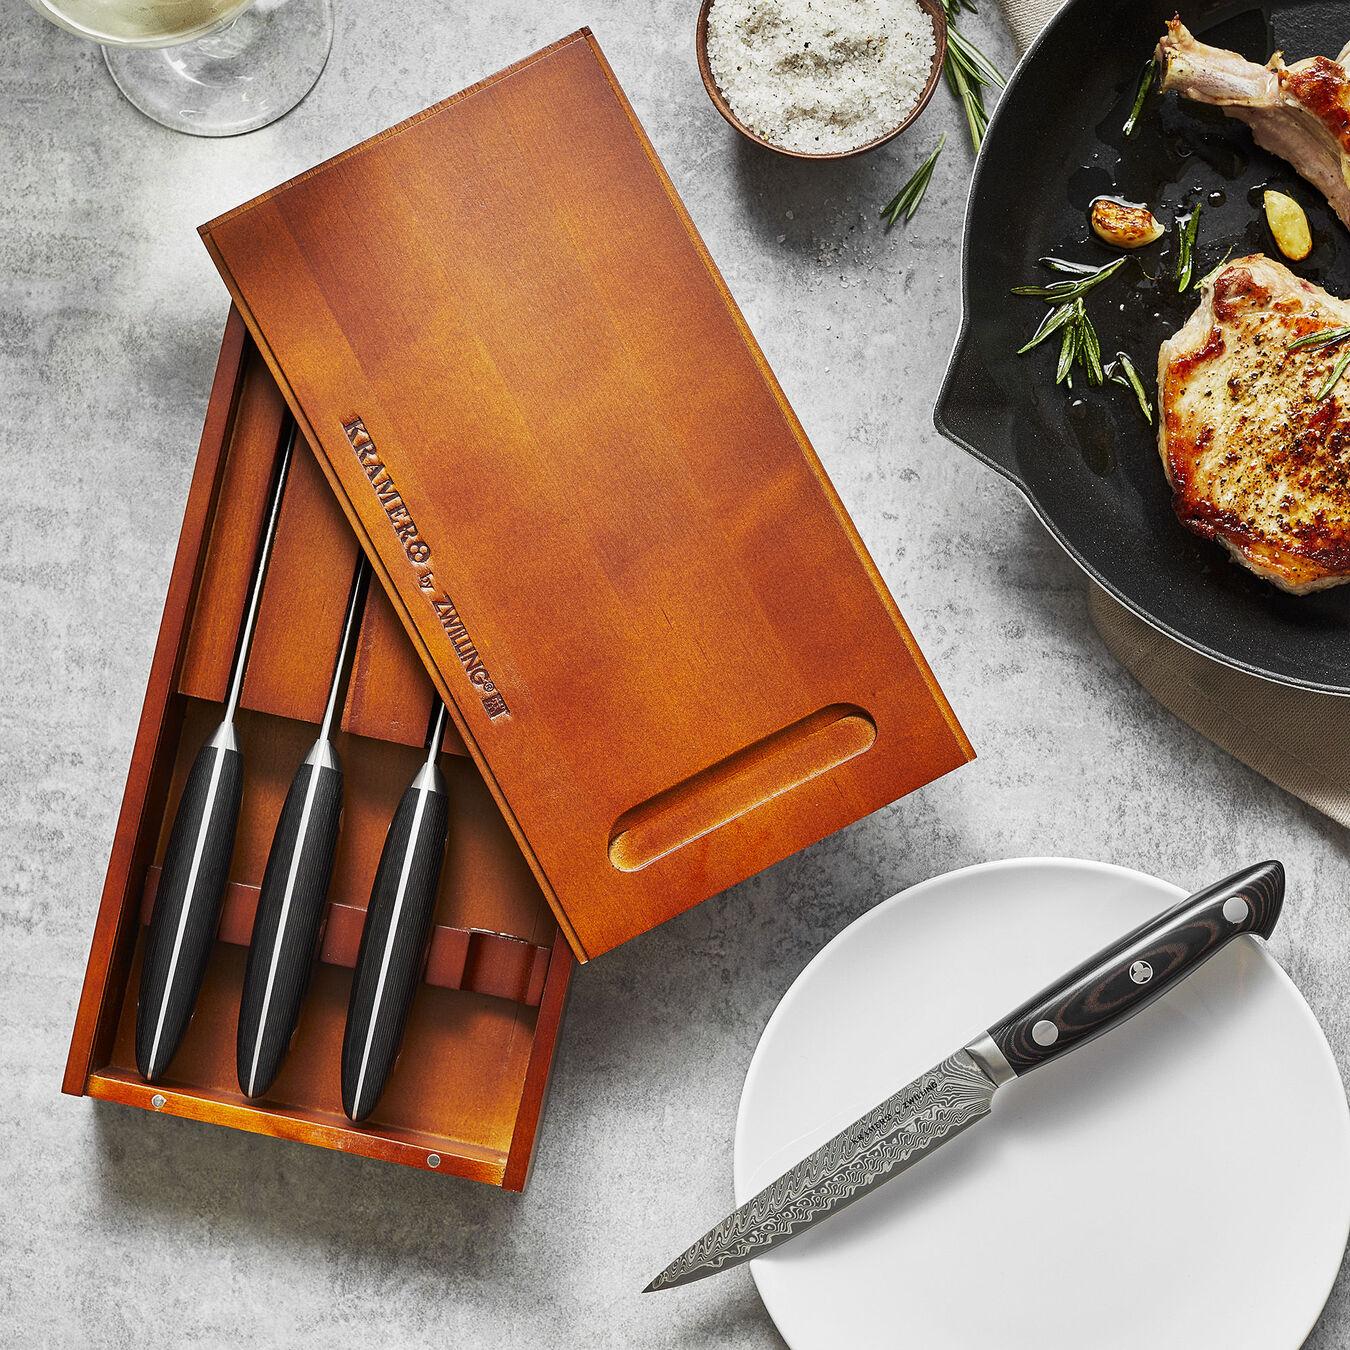 4-pc, Steak Knife Set,,large 6